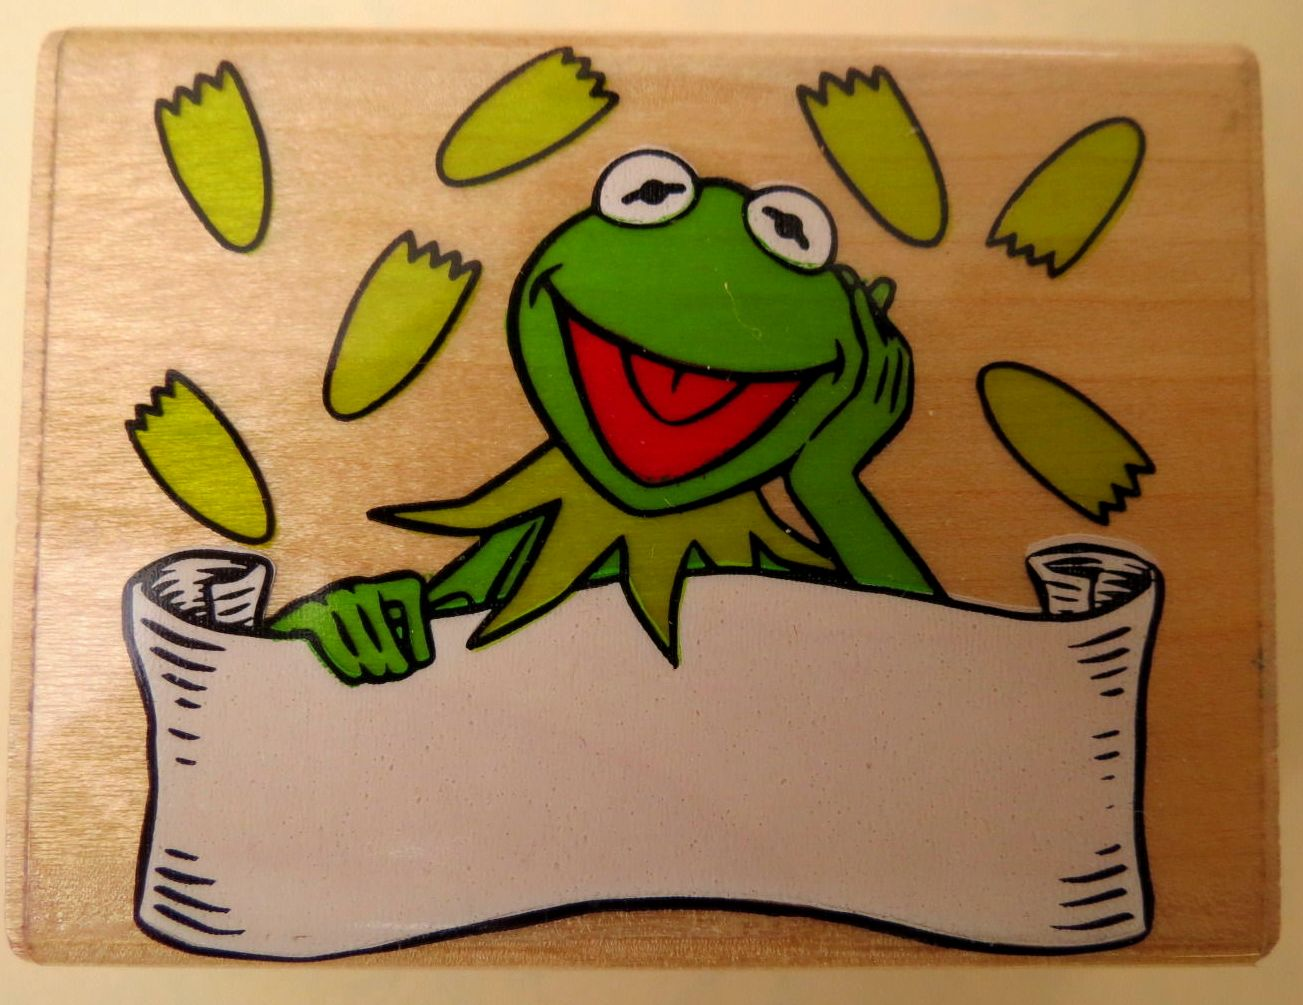 Muppet rubber stamps | kermit | Stamp, Kermit, Kermit the frog